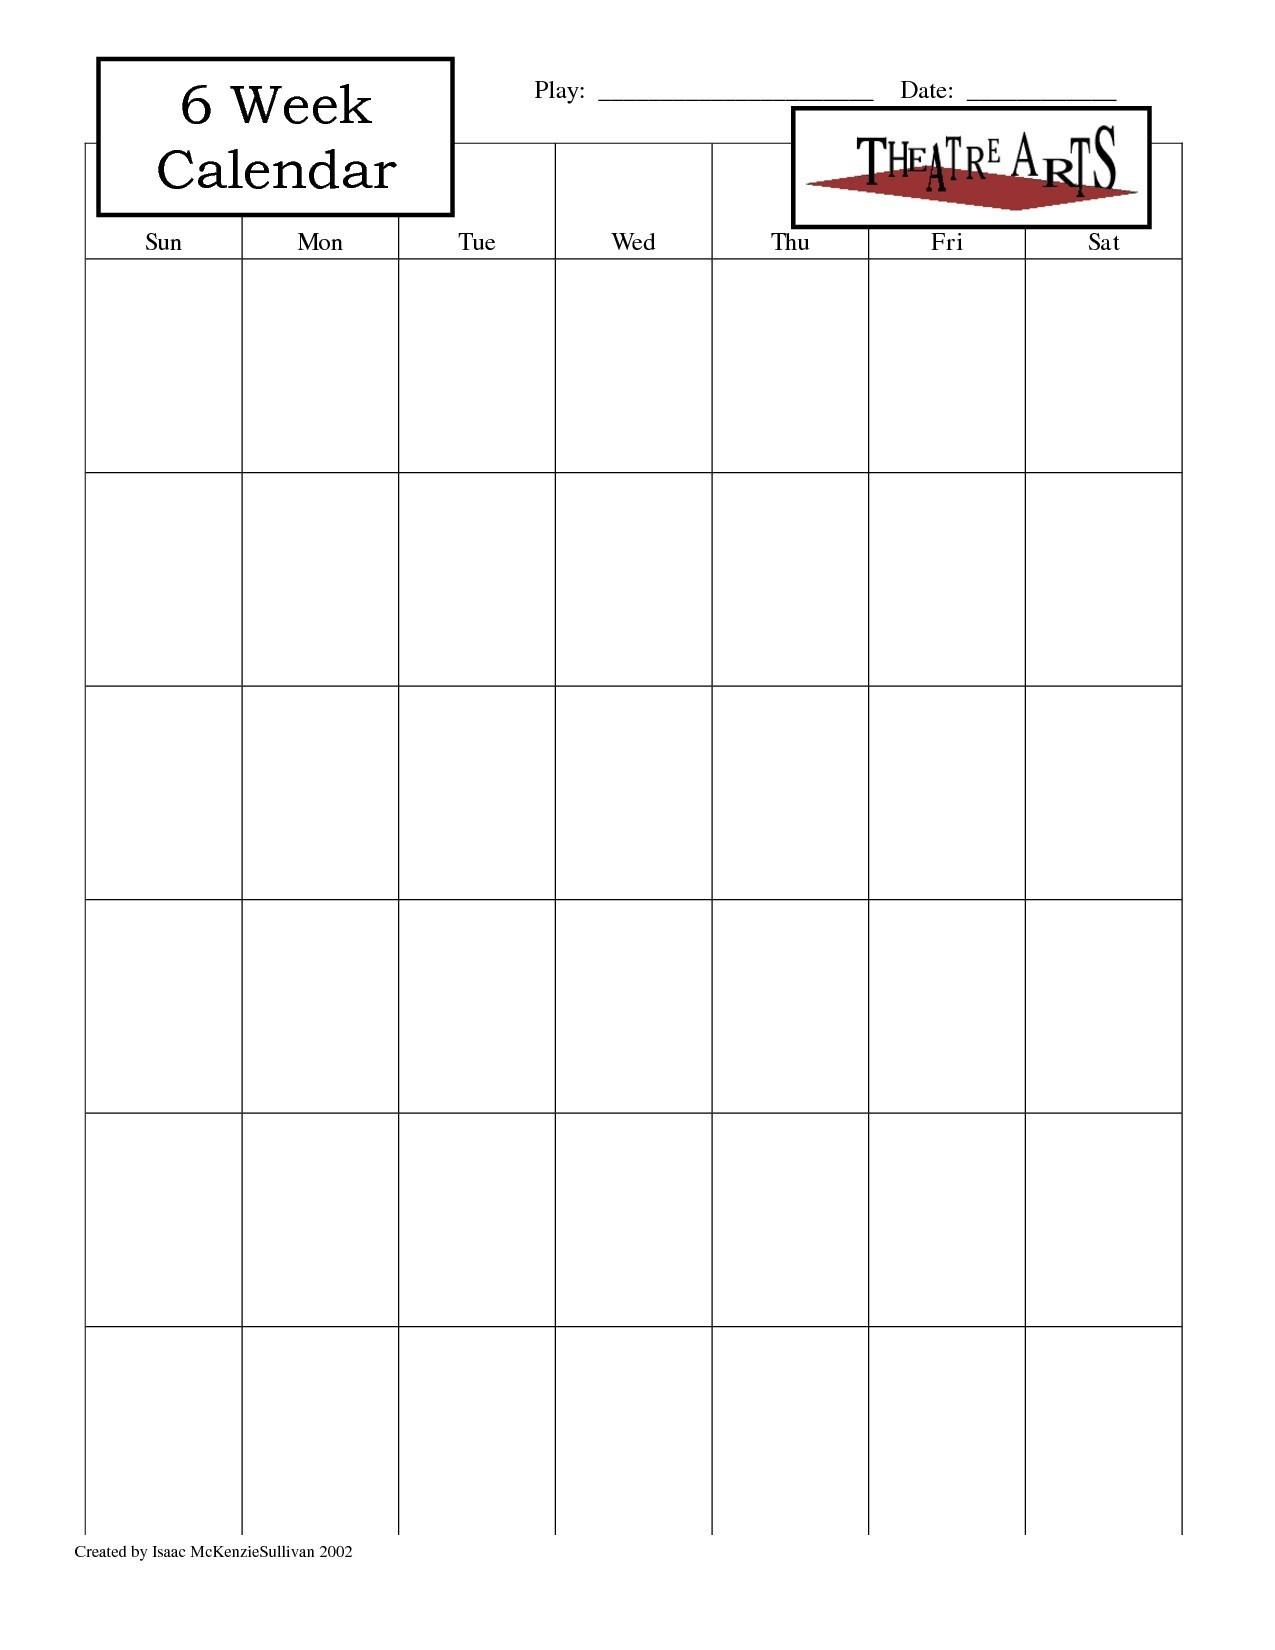 Blank 6 Week Calendar Template With Weeks 25971 Also On 6 Week intended for Blank 6 Week Calendar Template